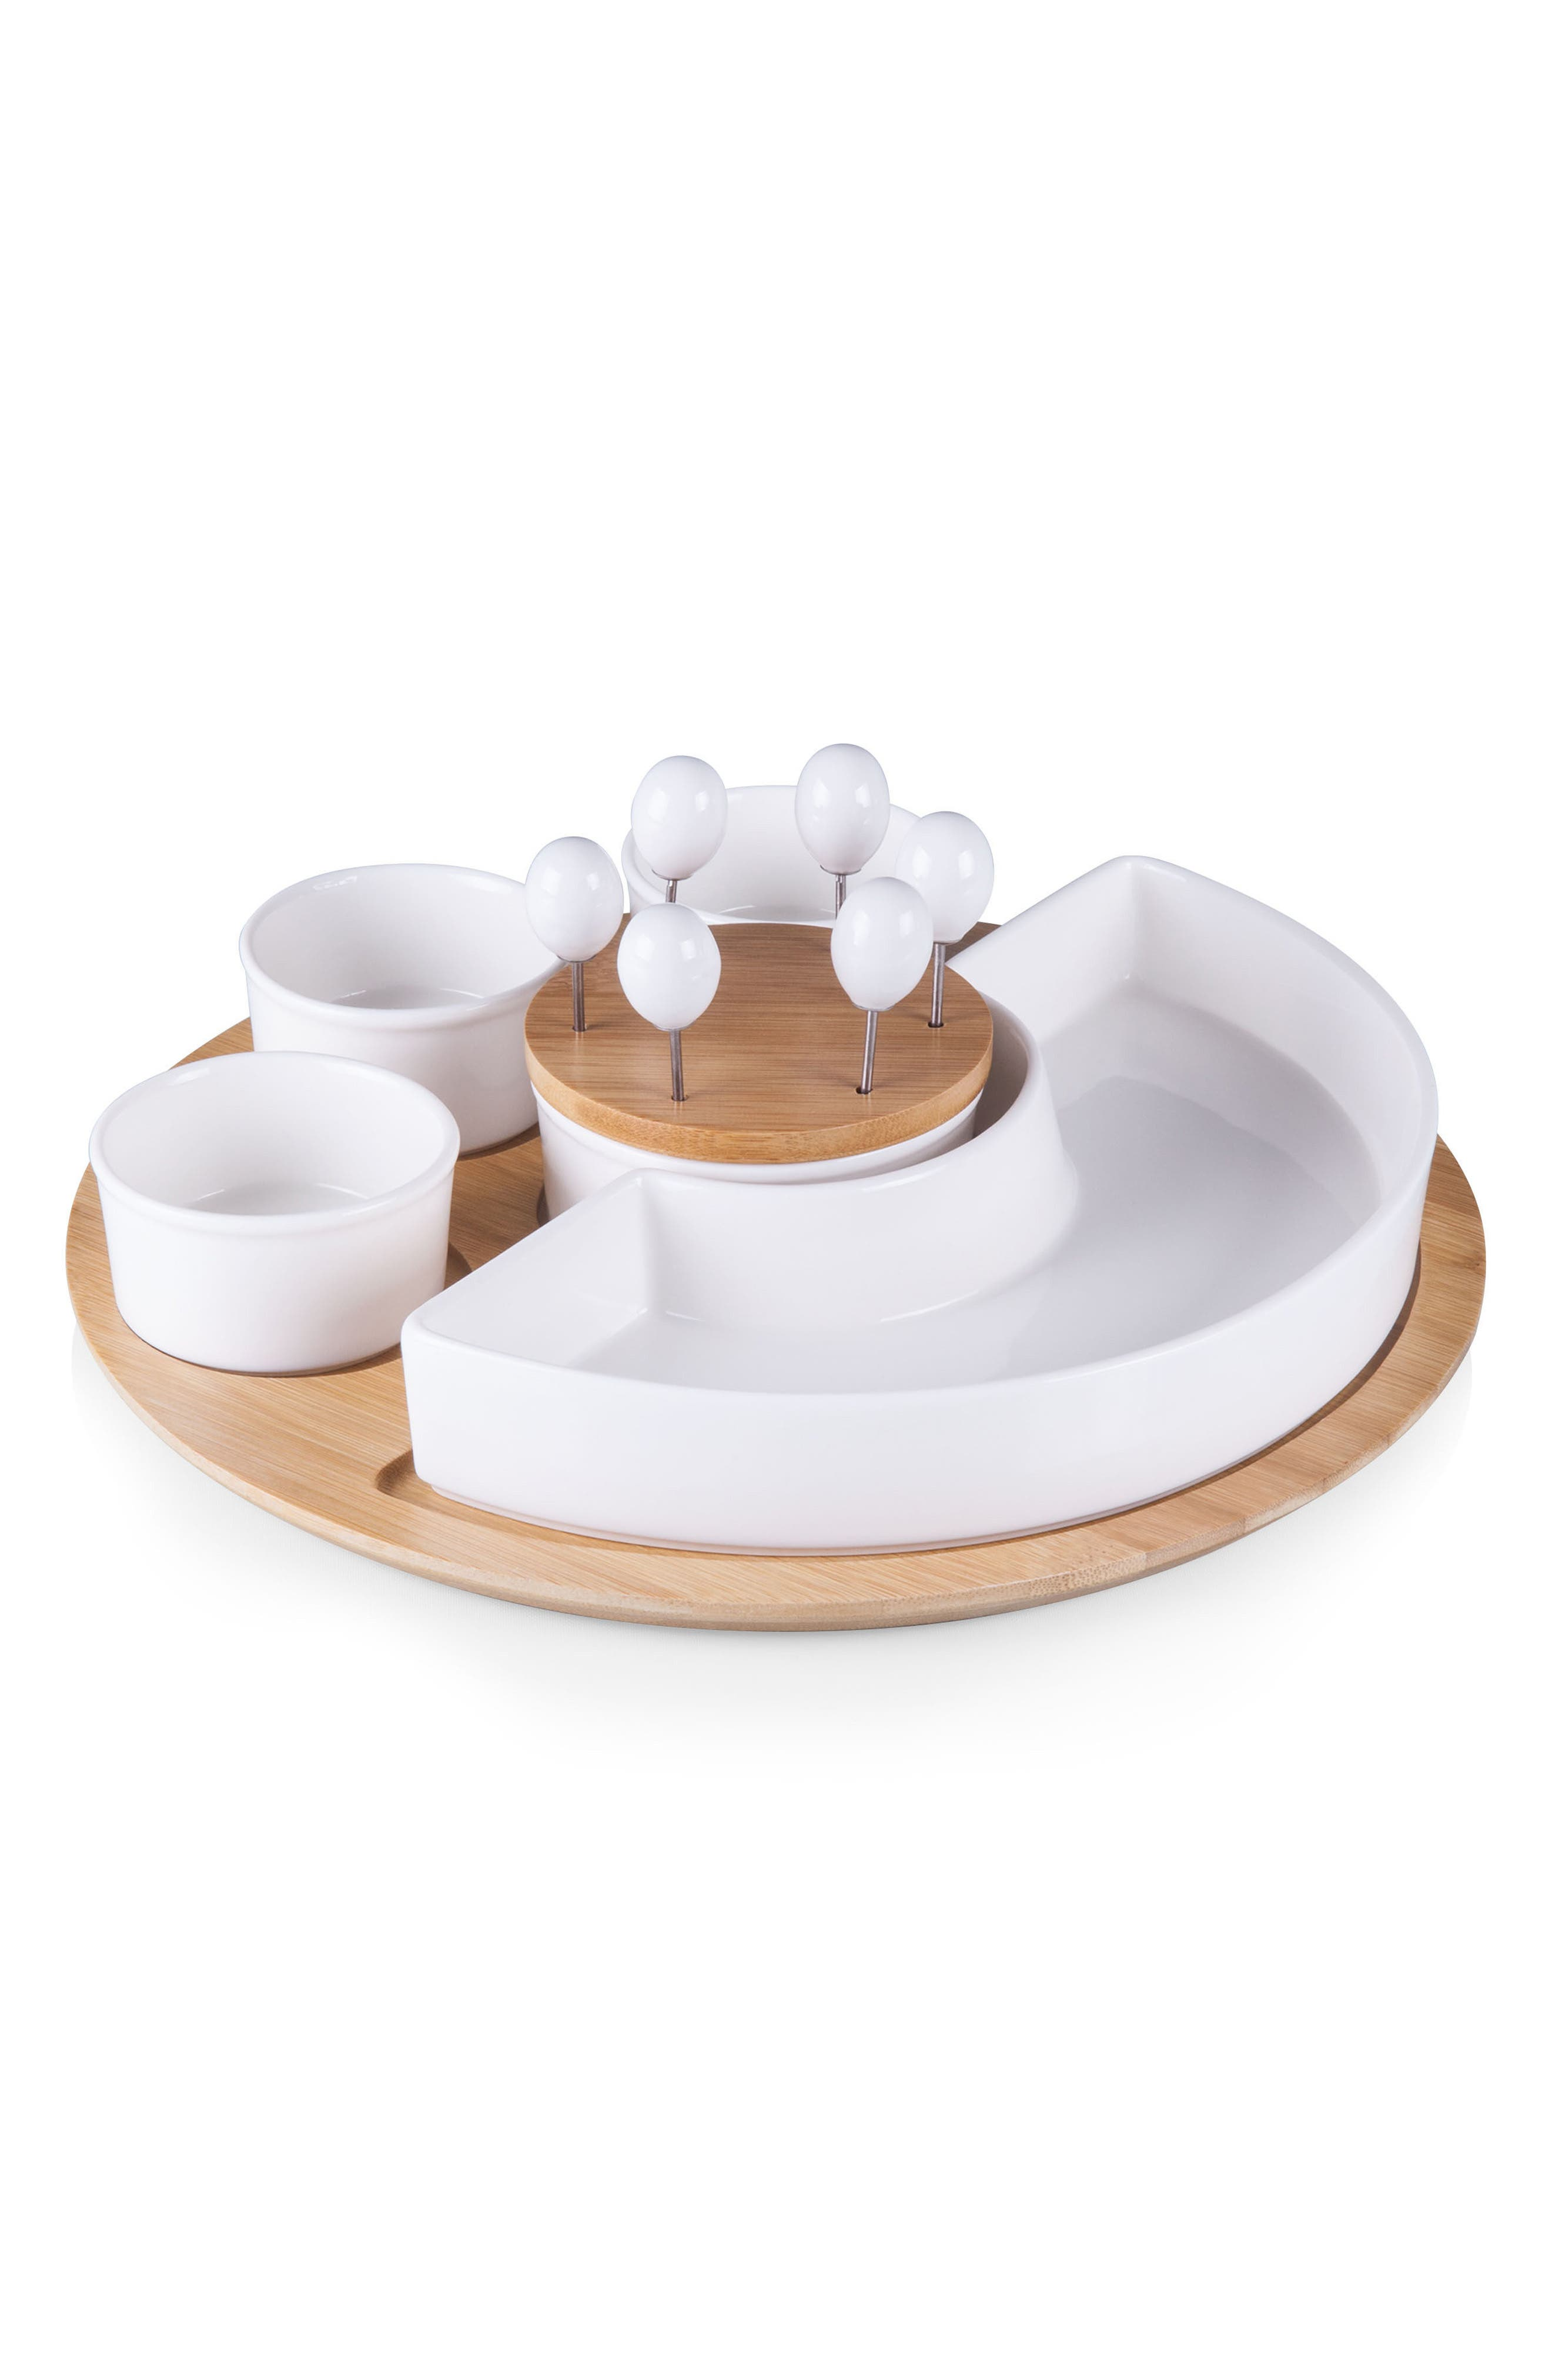 Symphony Appetizer Bowl Serving Set,                         Main,                         color, BROWN/ WHITE